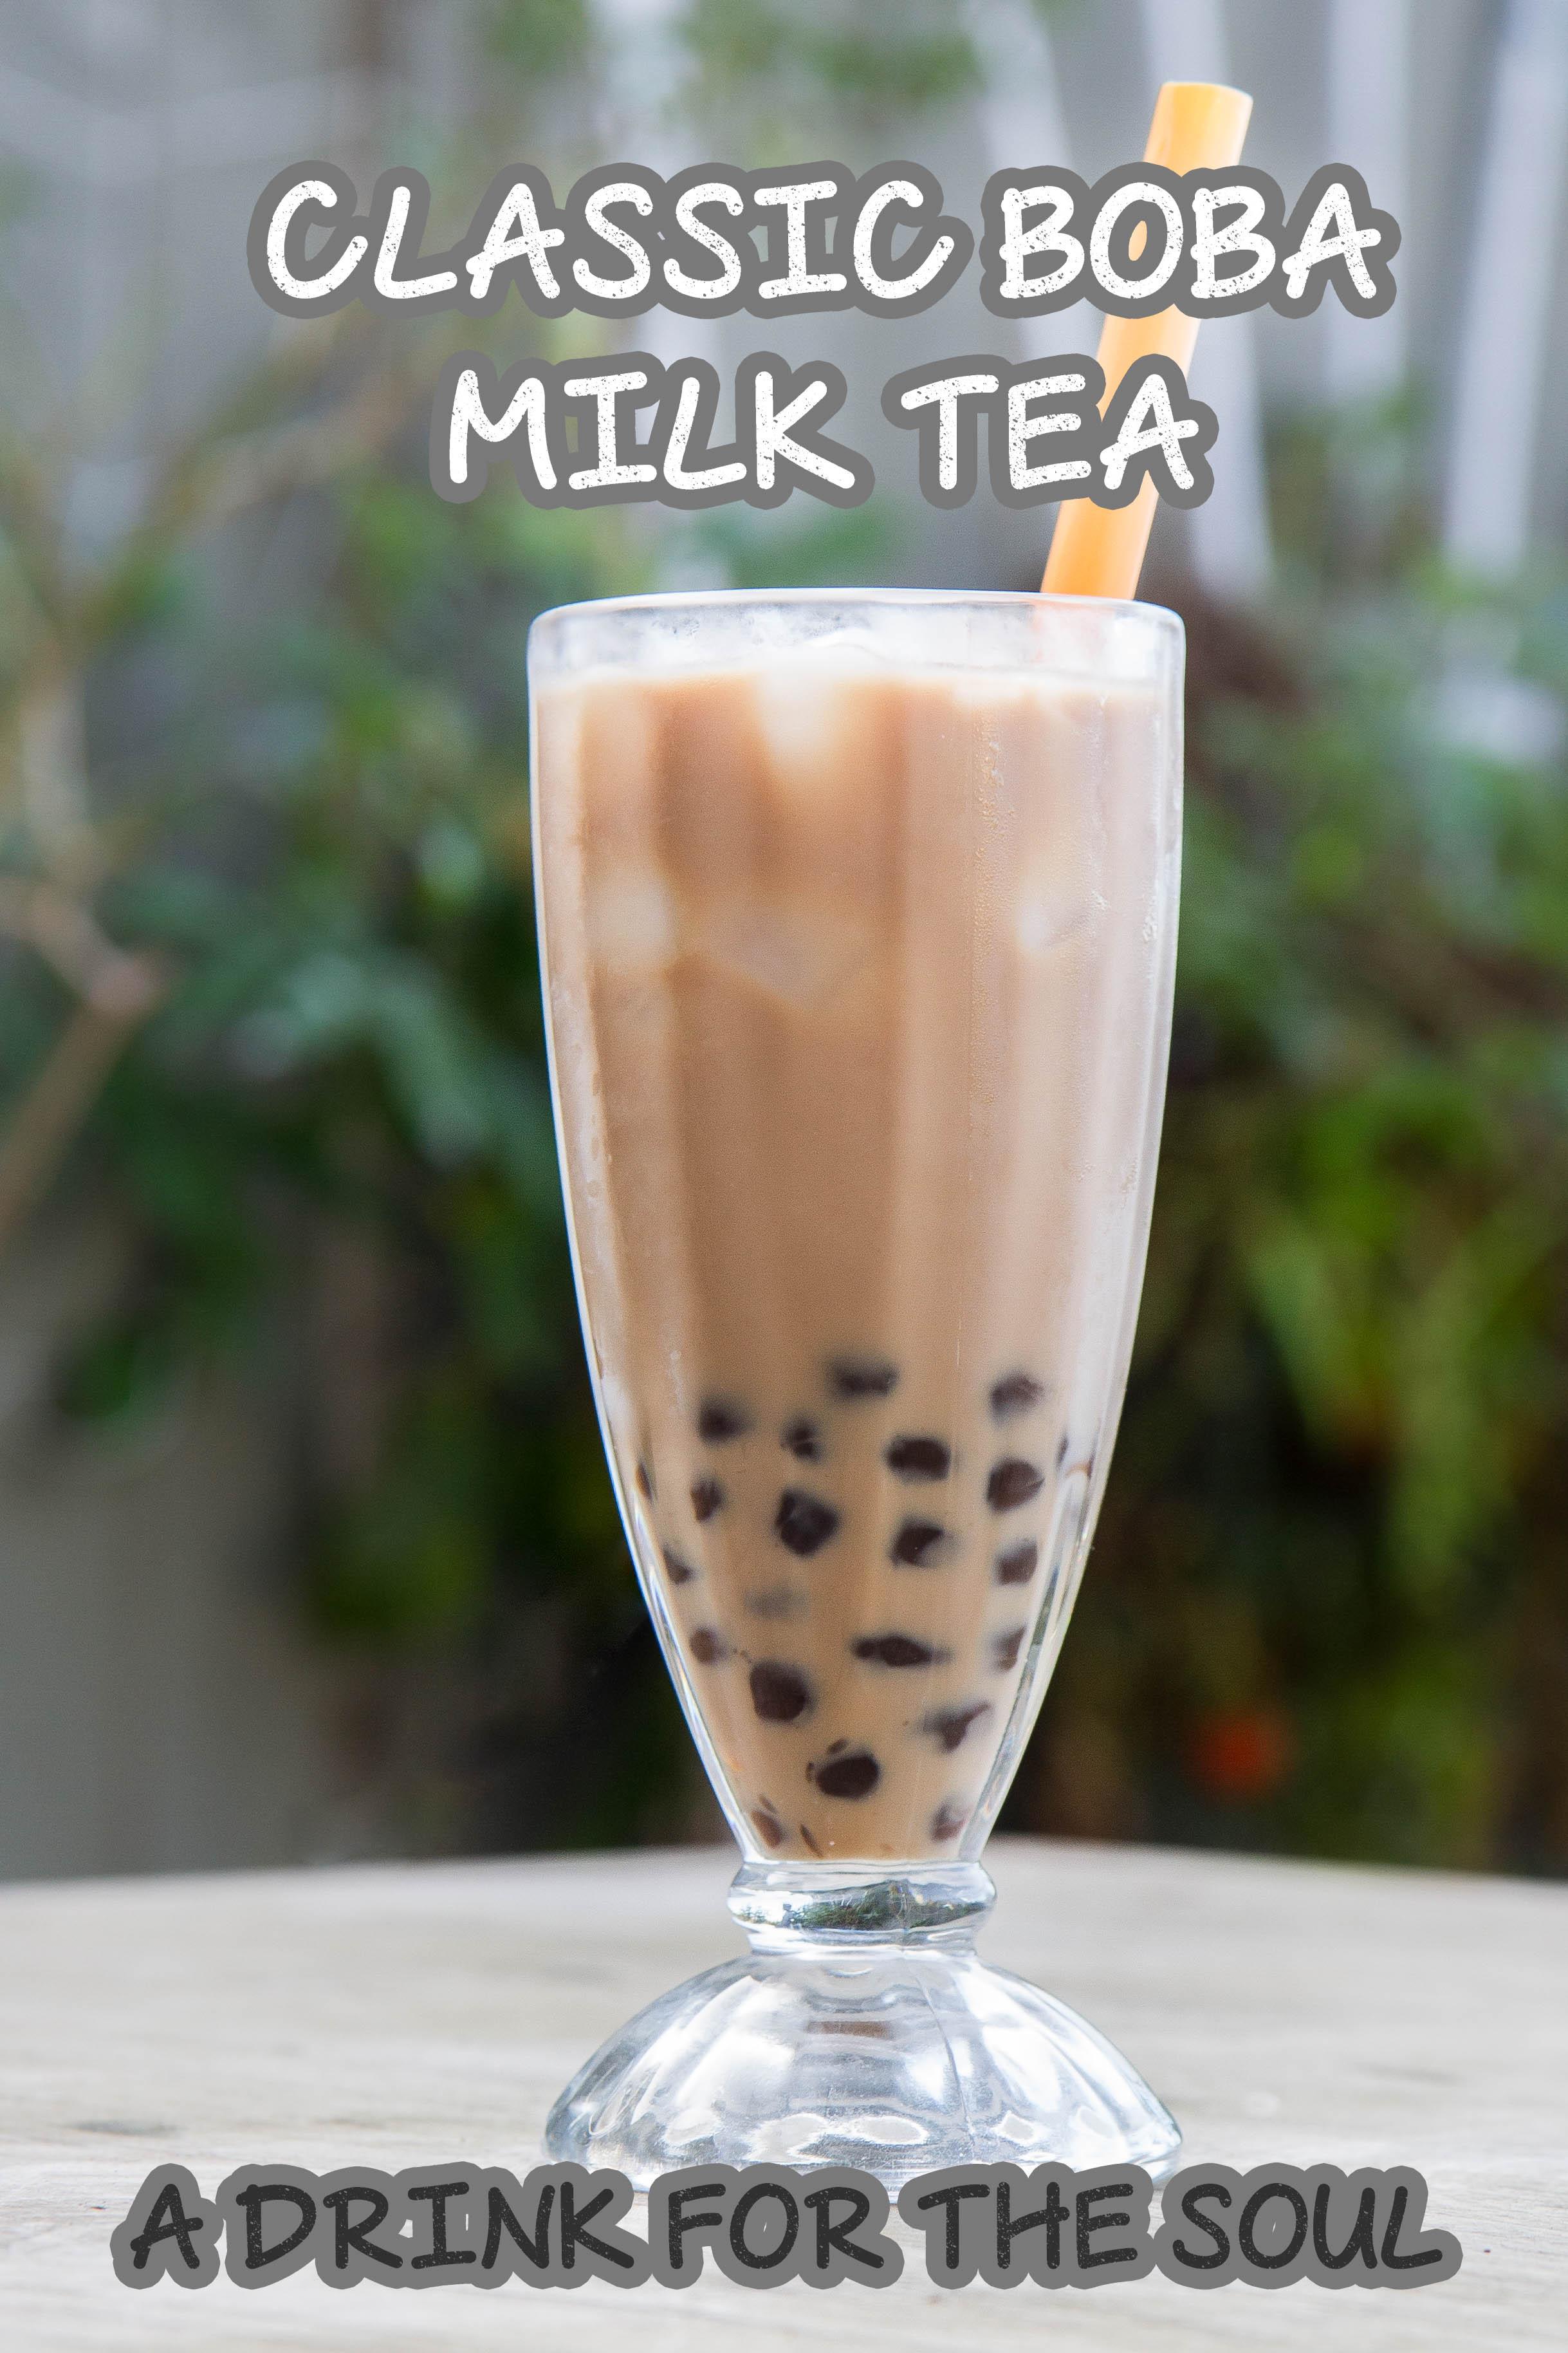 Classic Boba Milk Tea